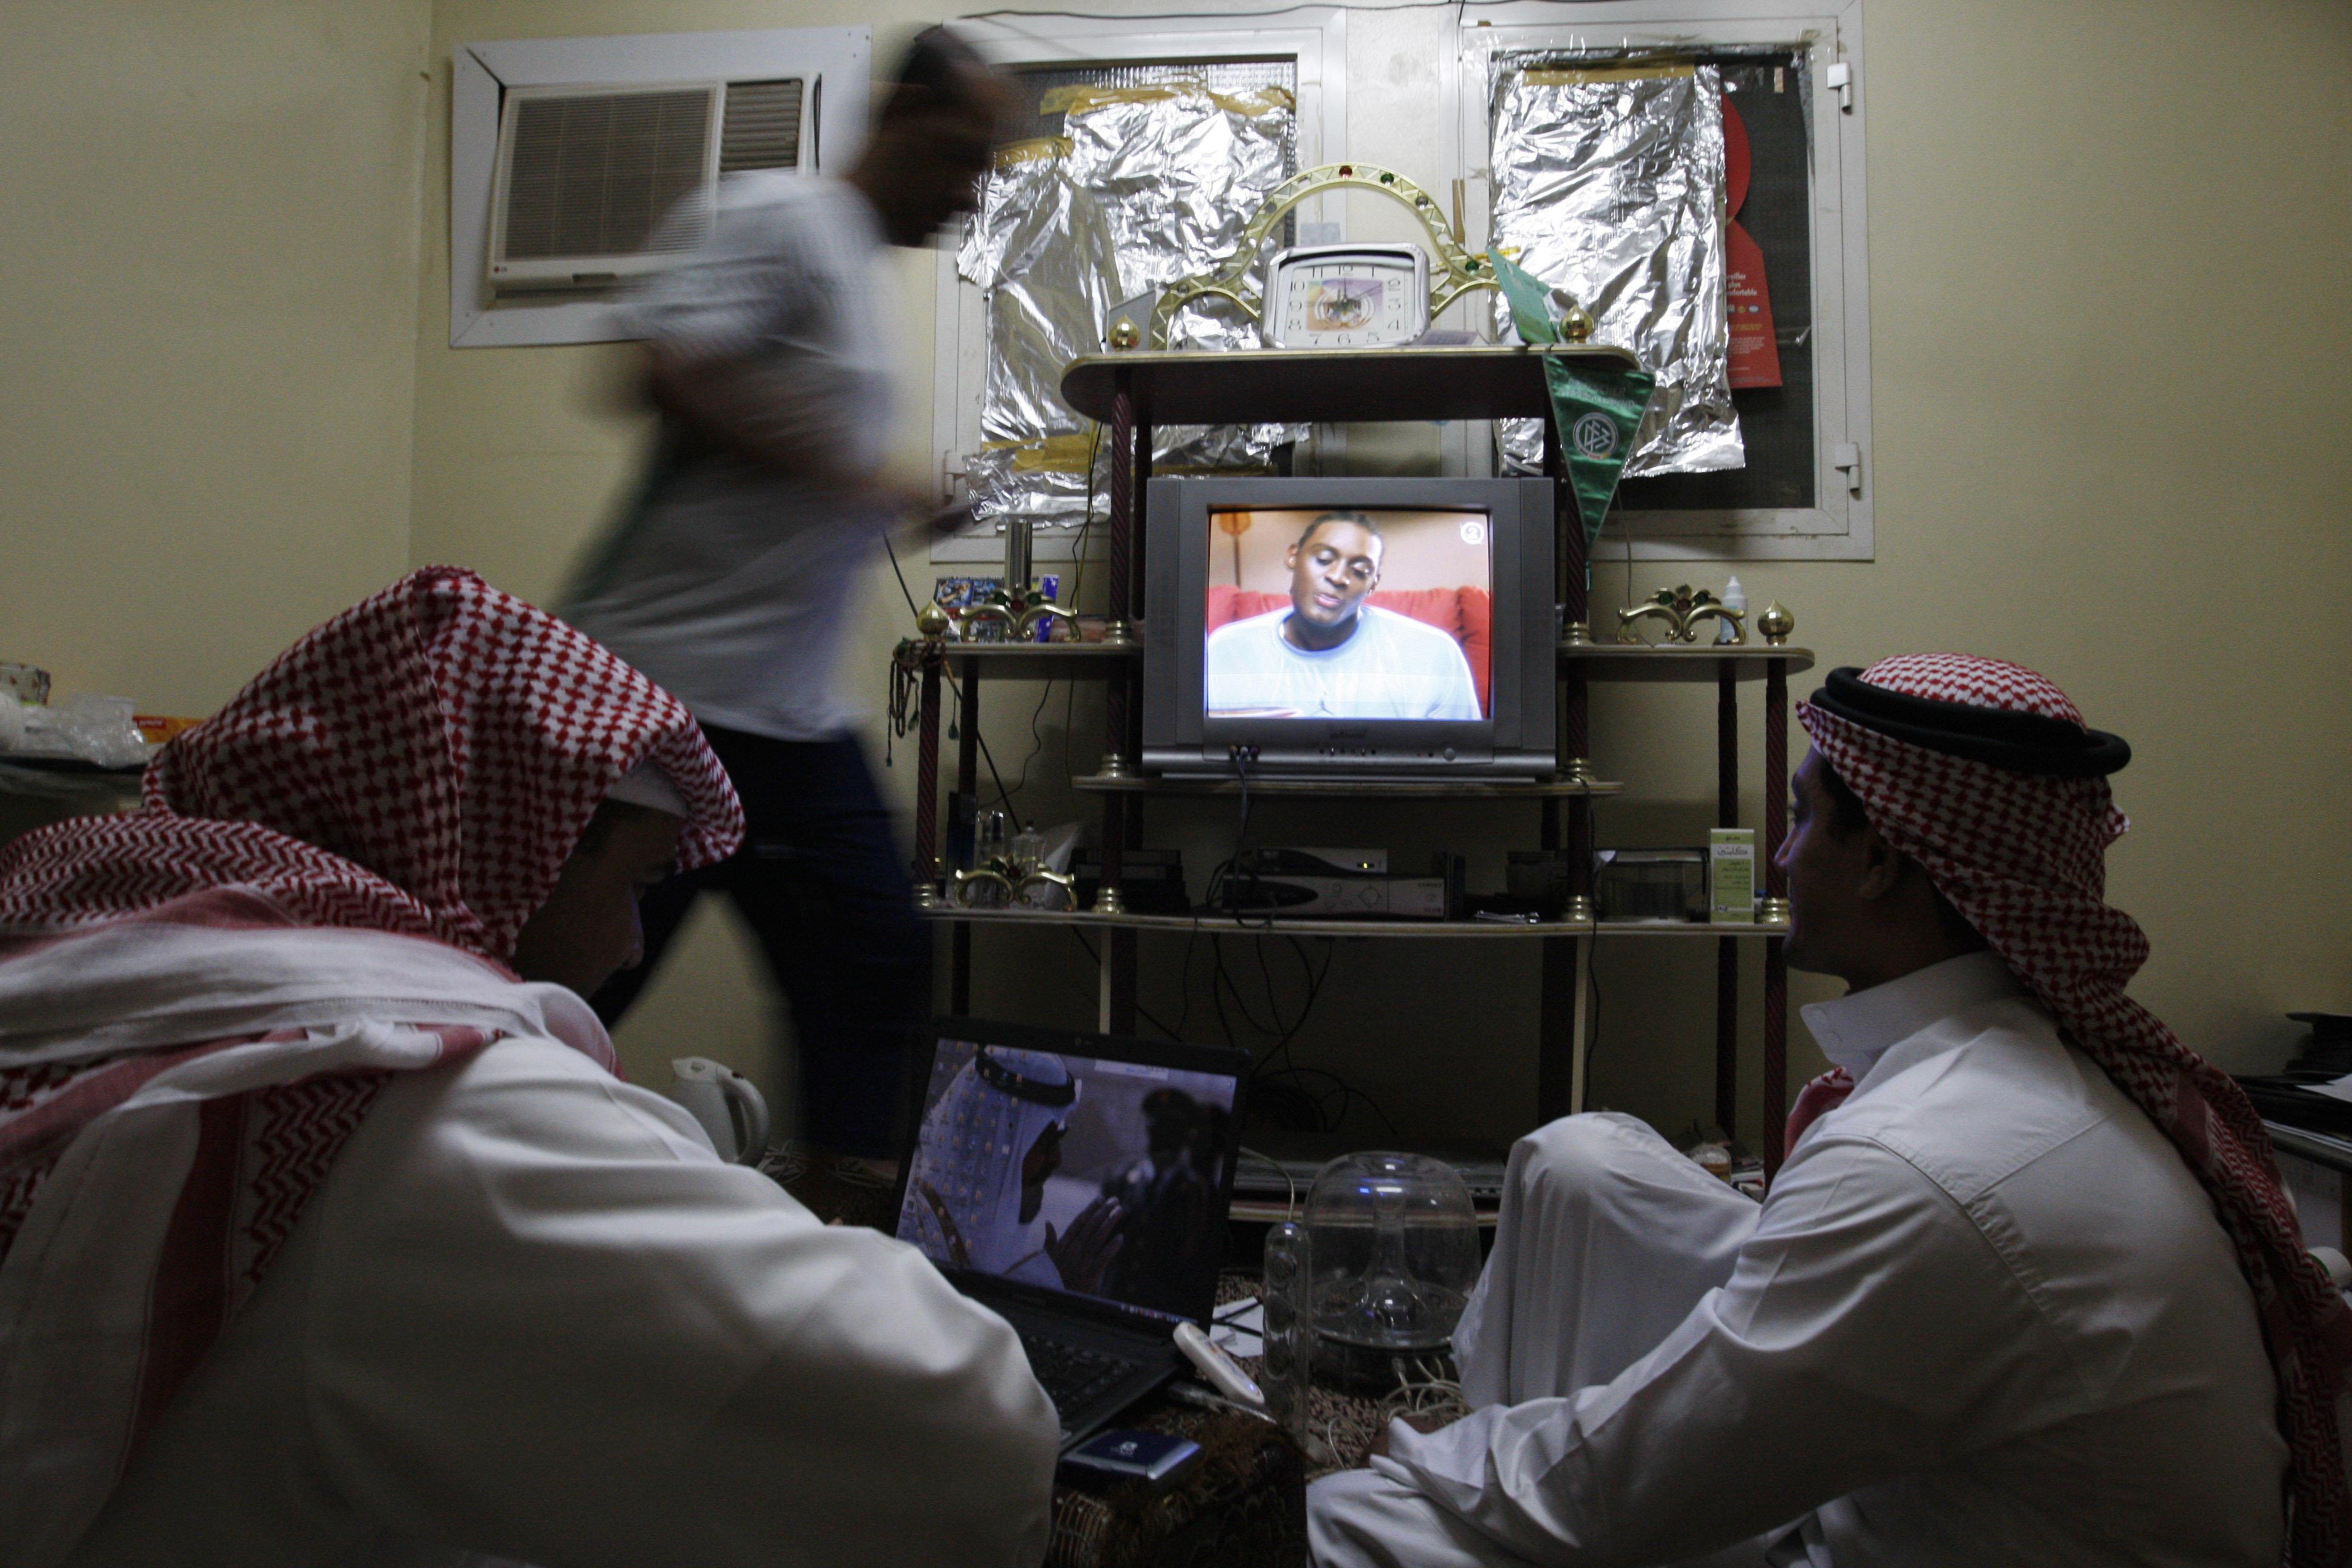 Saudi men watch satellite television at home in Riyadh, Saudi Arabia, Sept. 16, 2008. (AP Photo/Hassan Ammar)